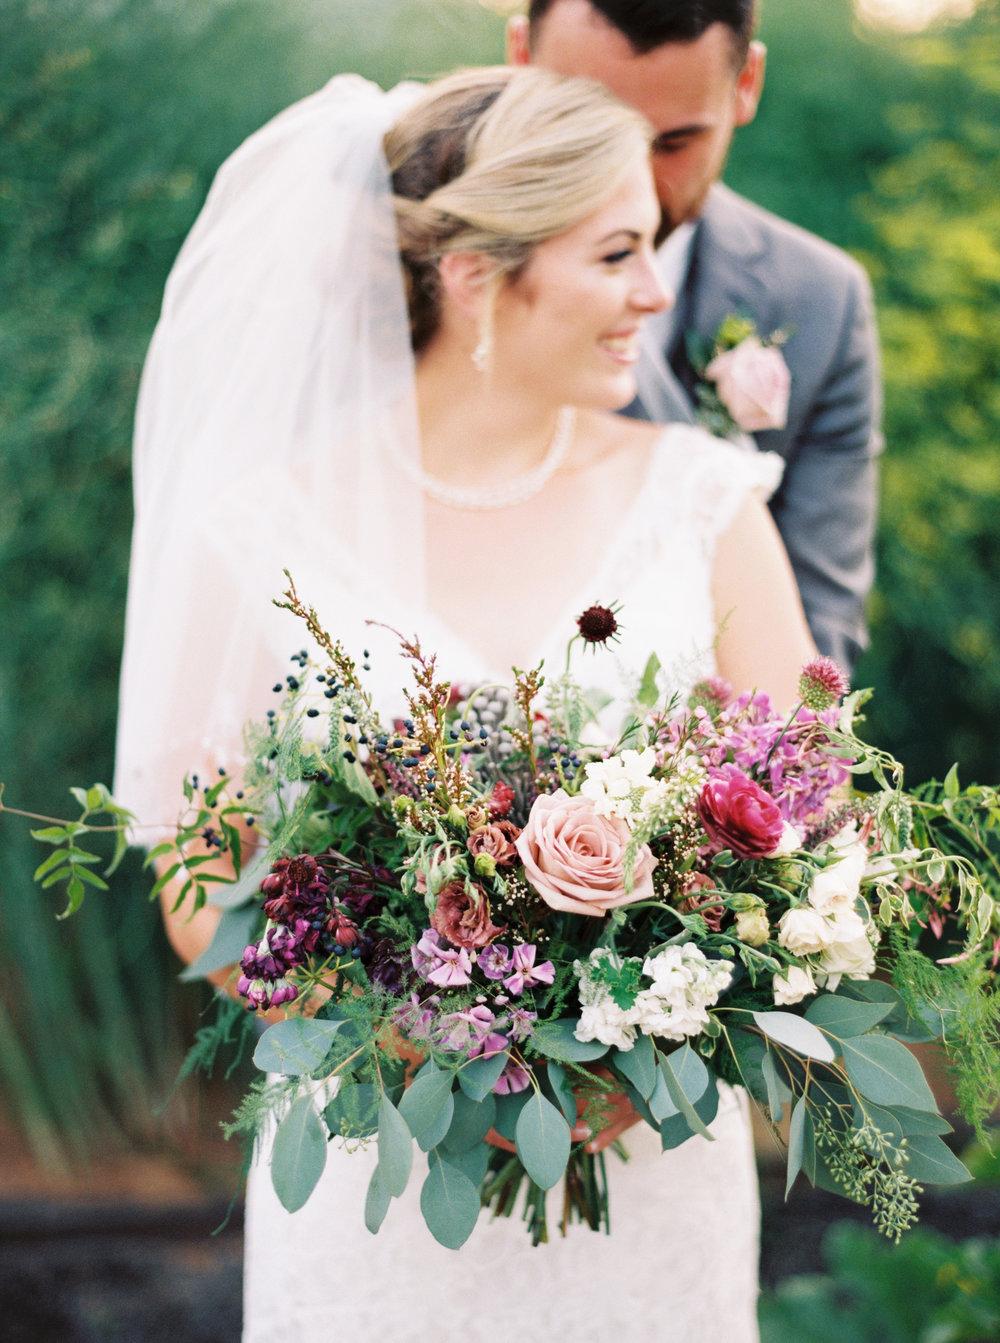 Laura + Austin - Intimate Backyard Wedding